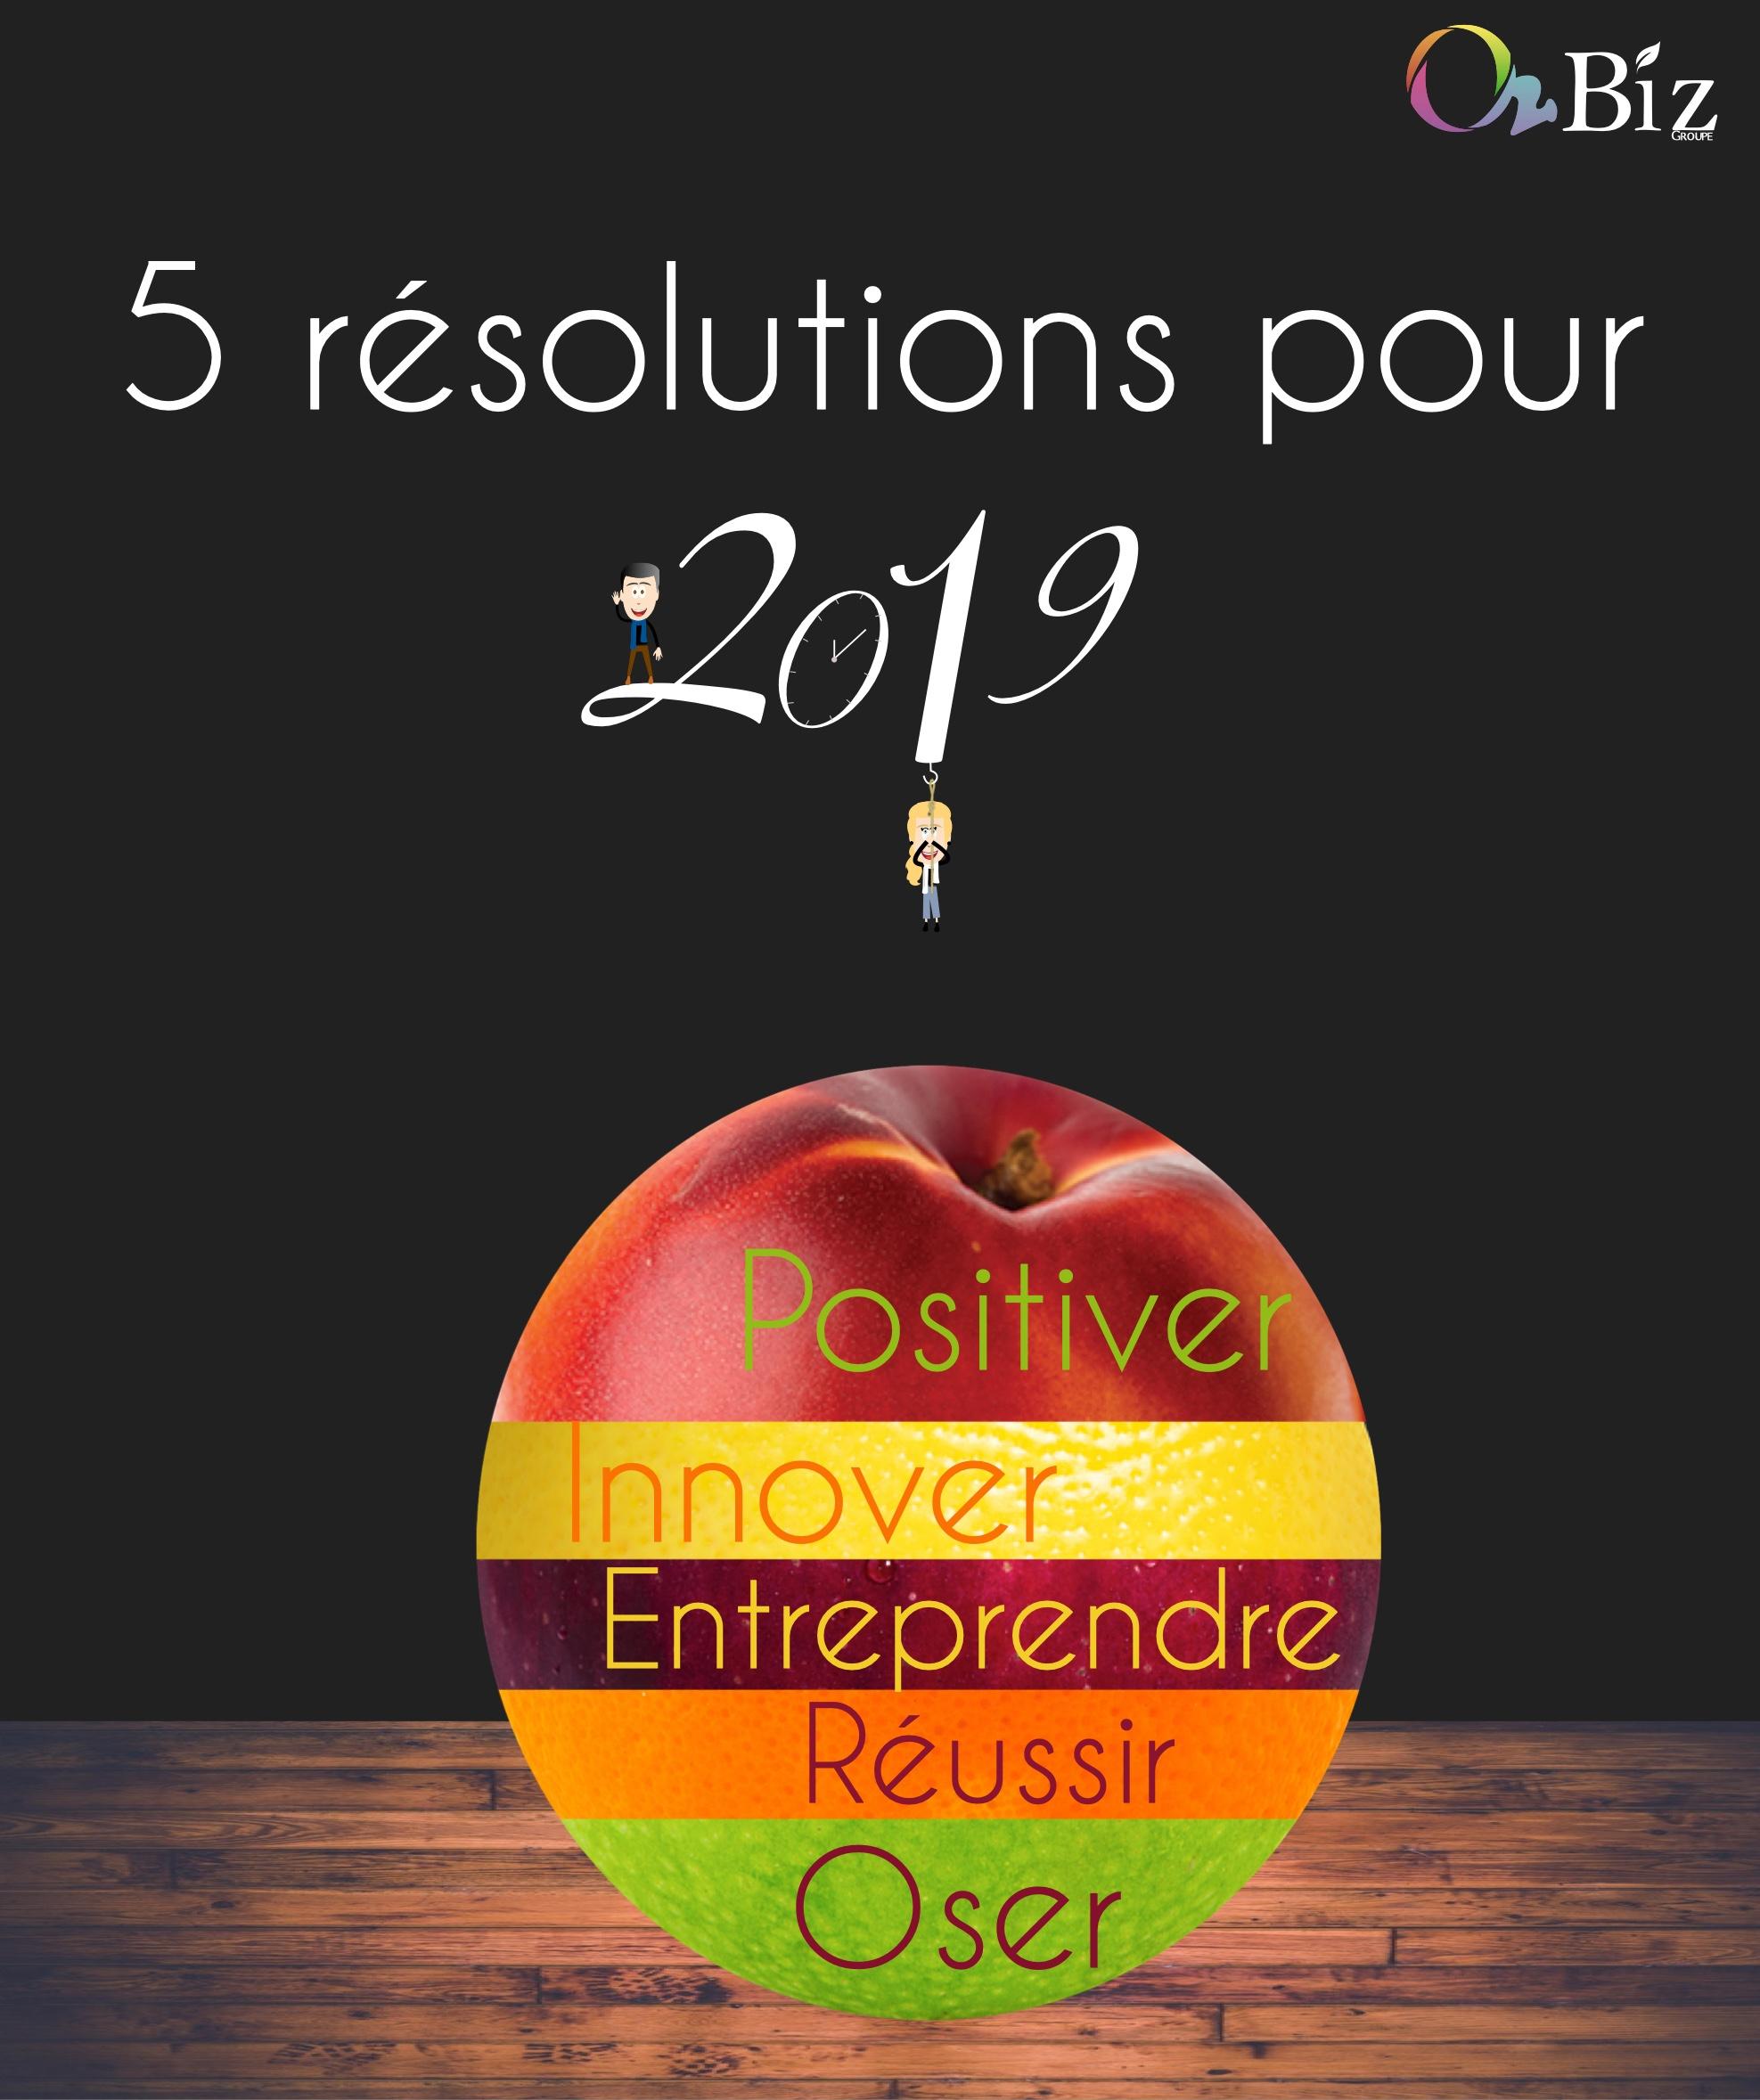 o2style post o2biz nouvel an